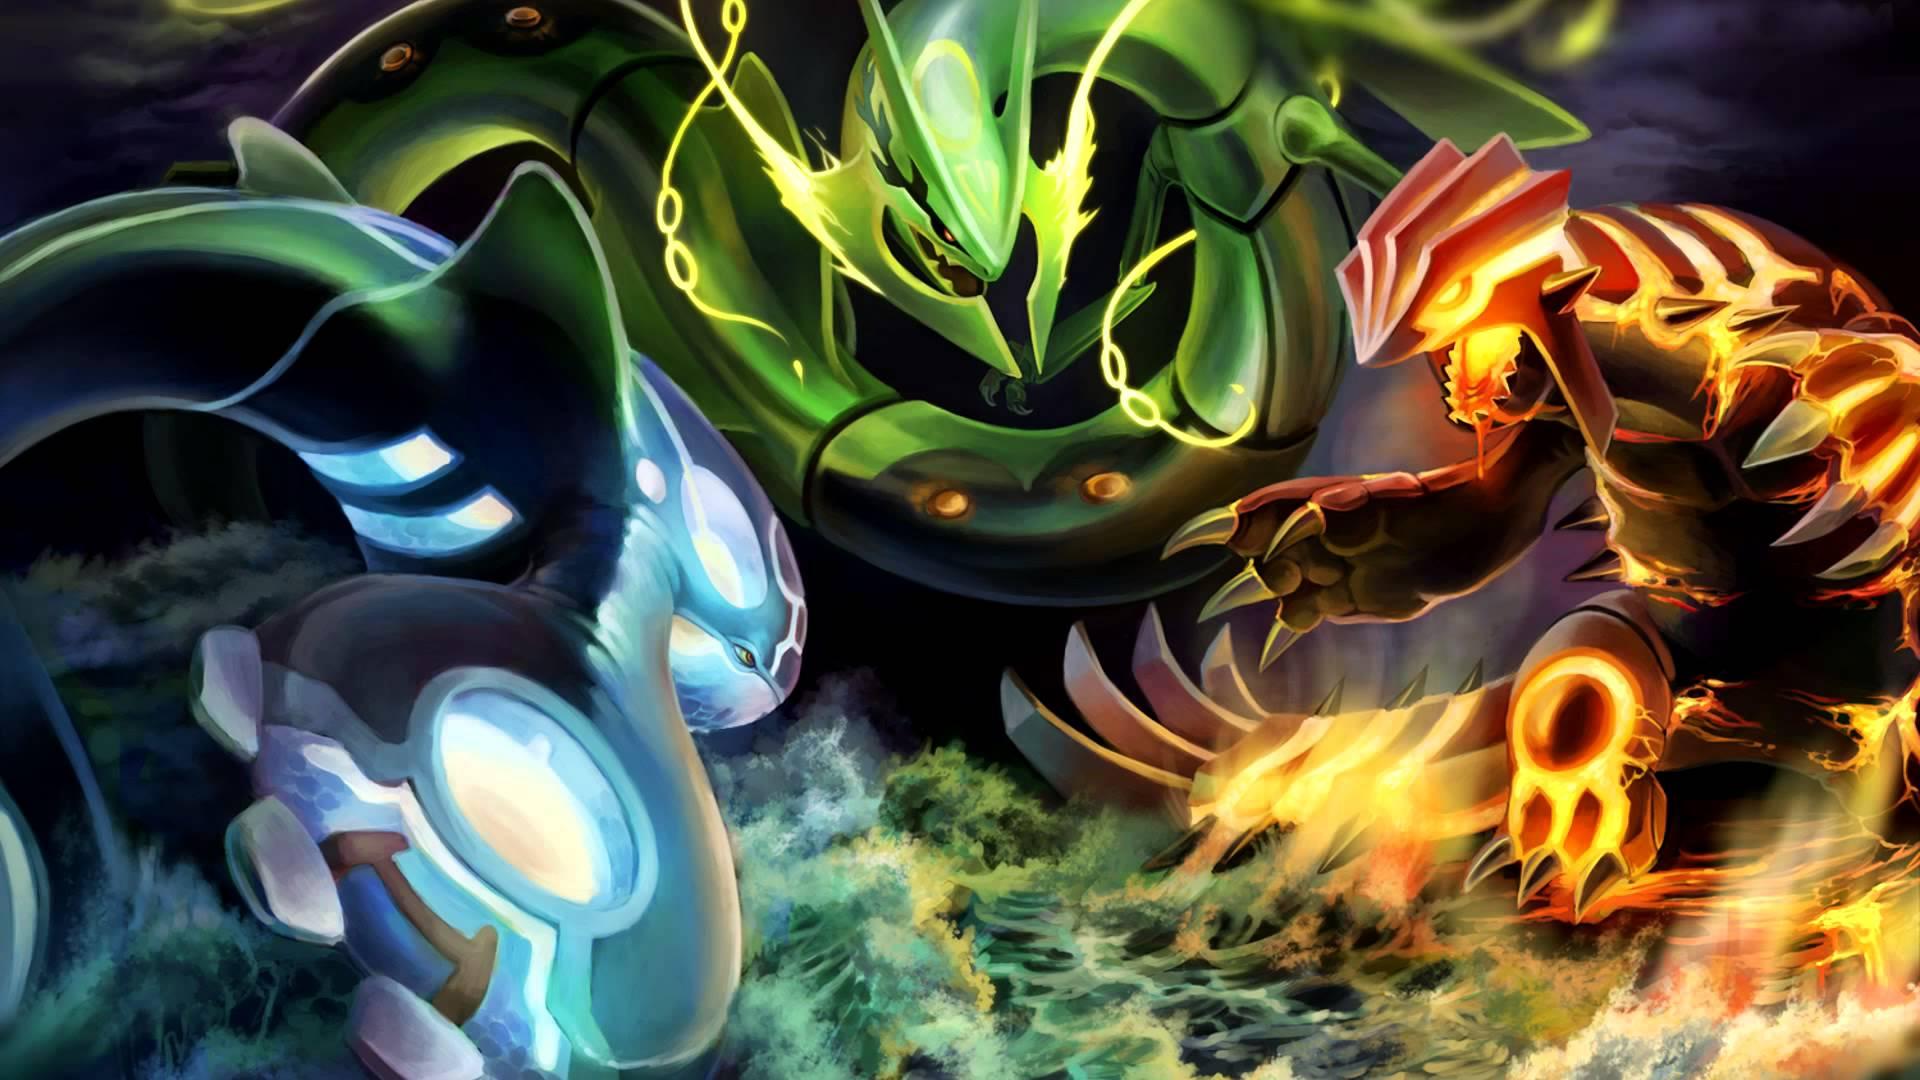 Downloading A Legendary Pokemon Wallpaper